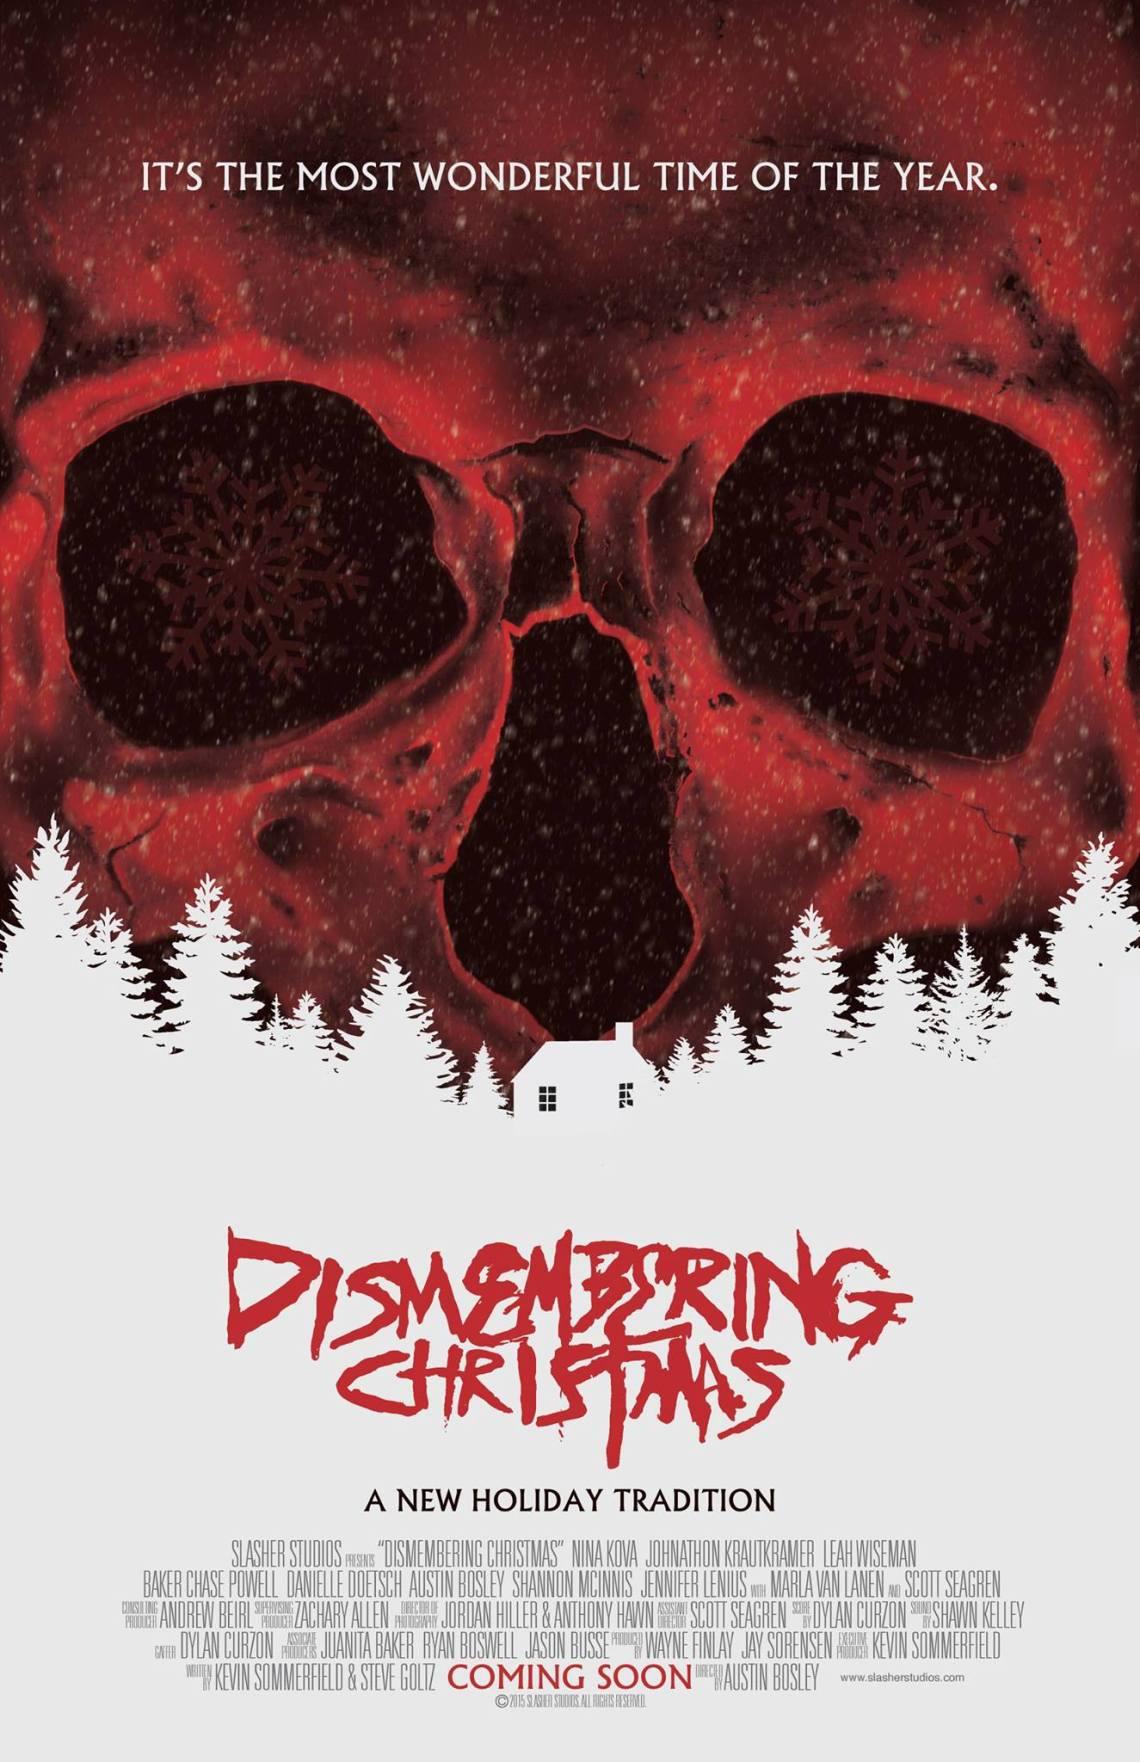 Slasher Studios / Dismembering Christmas